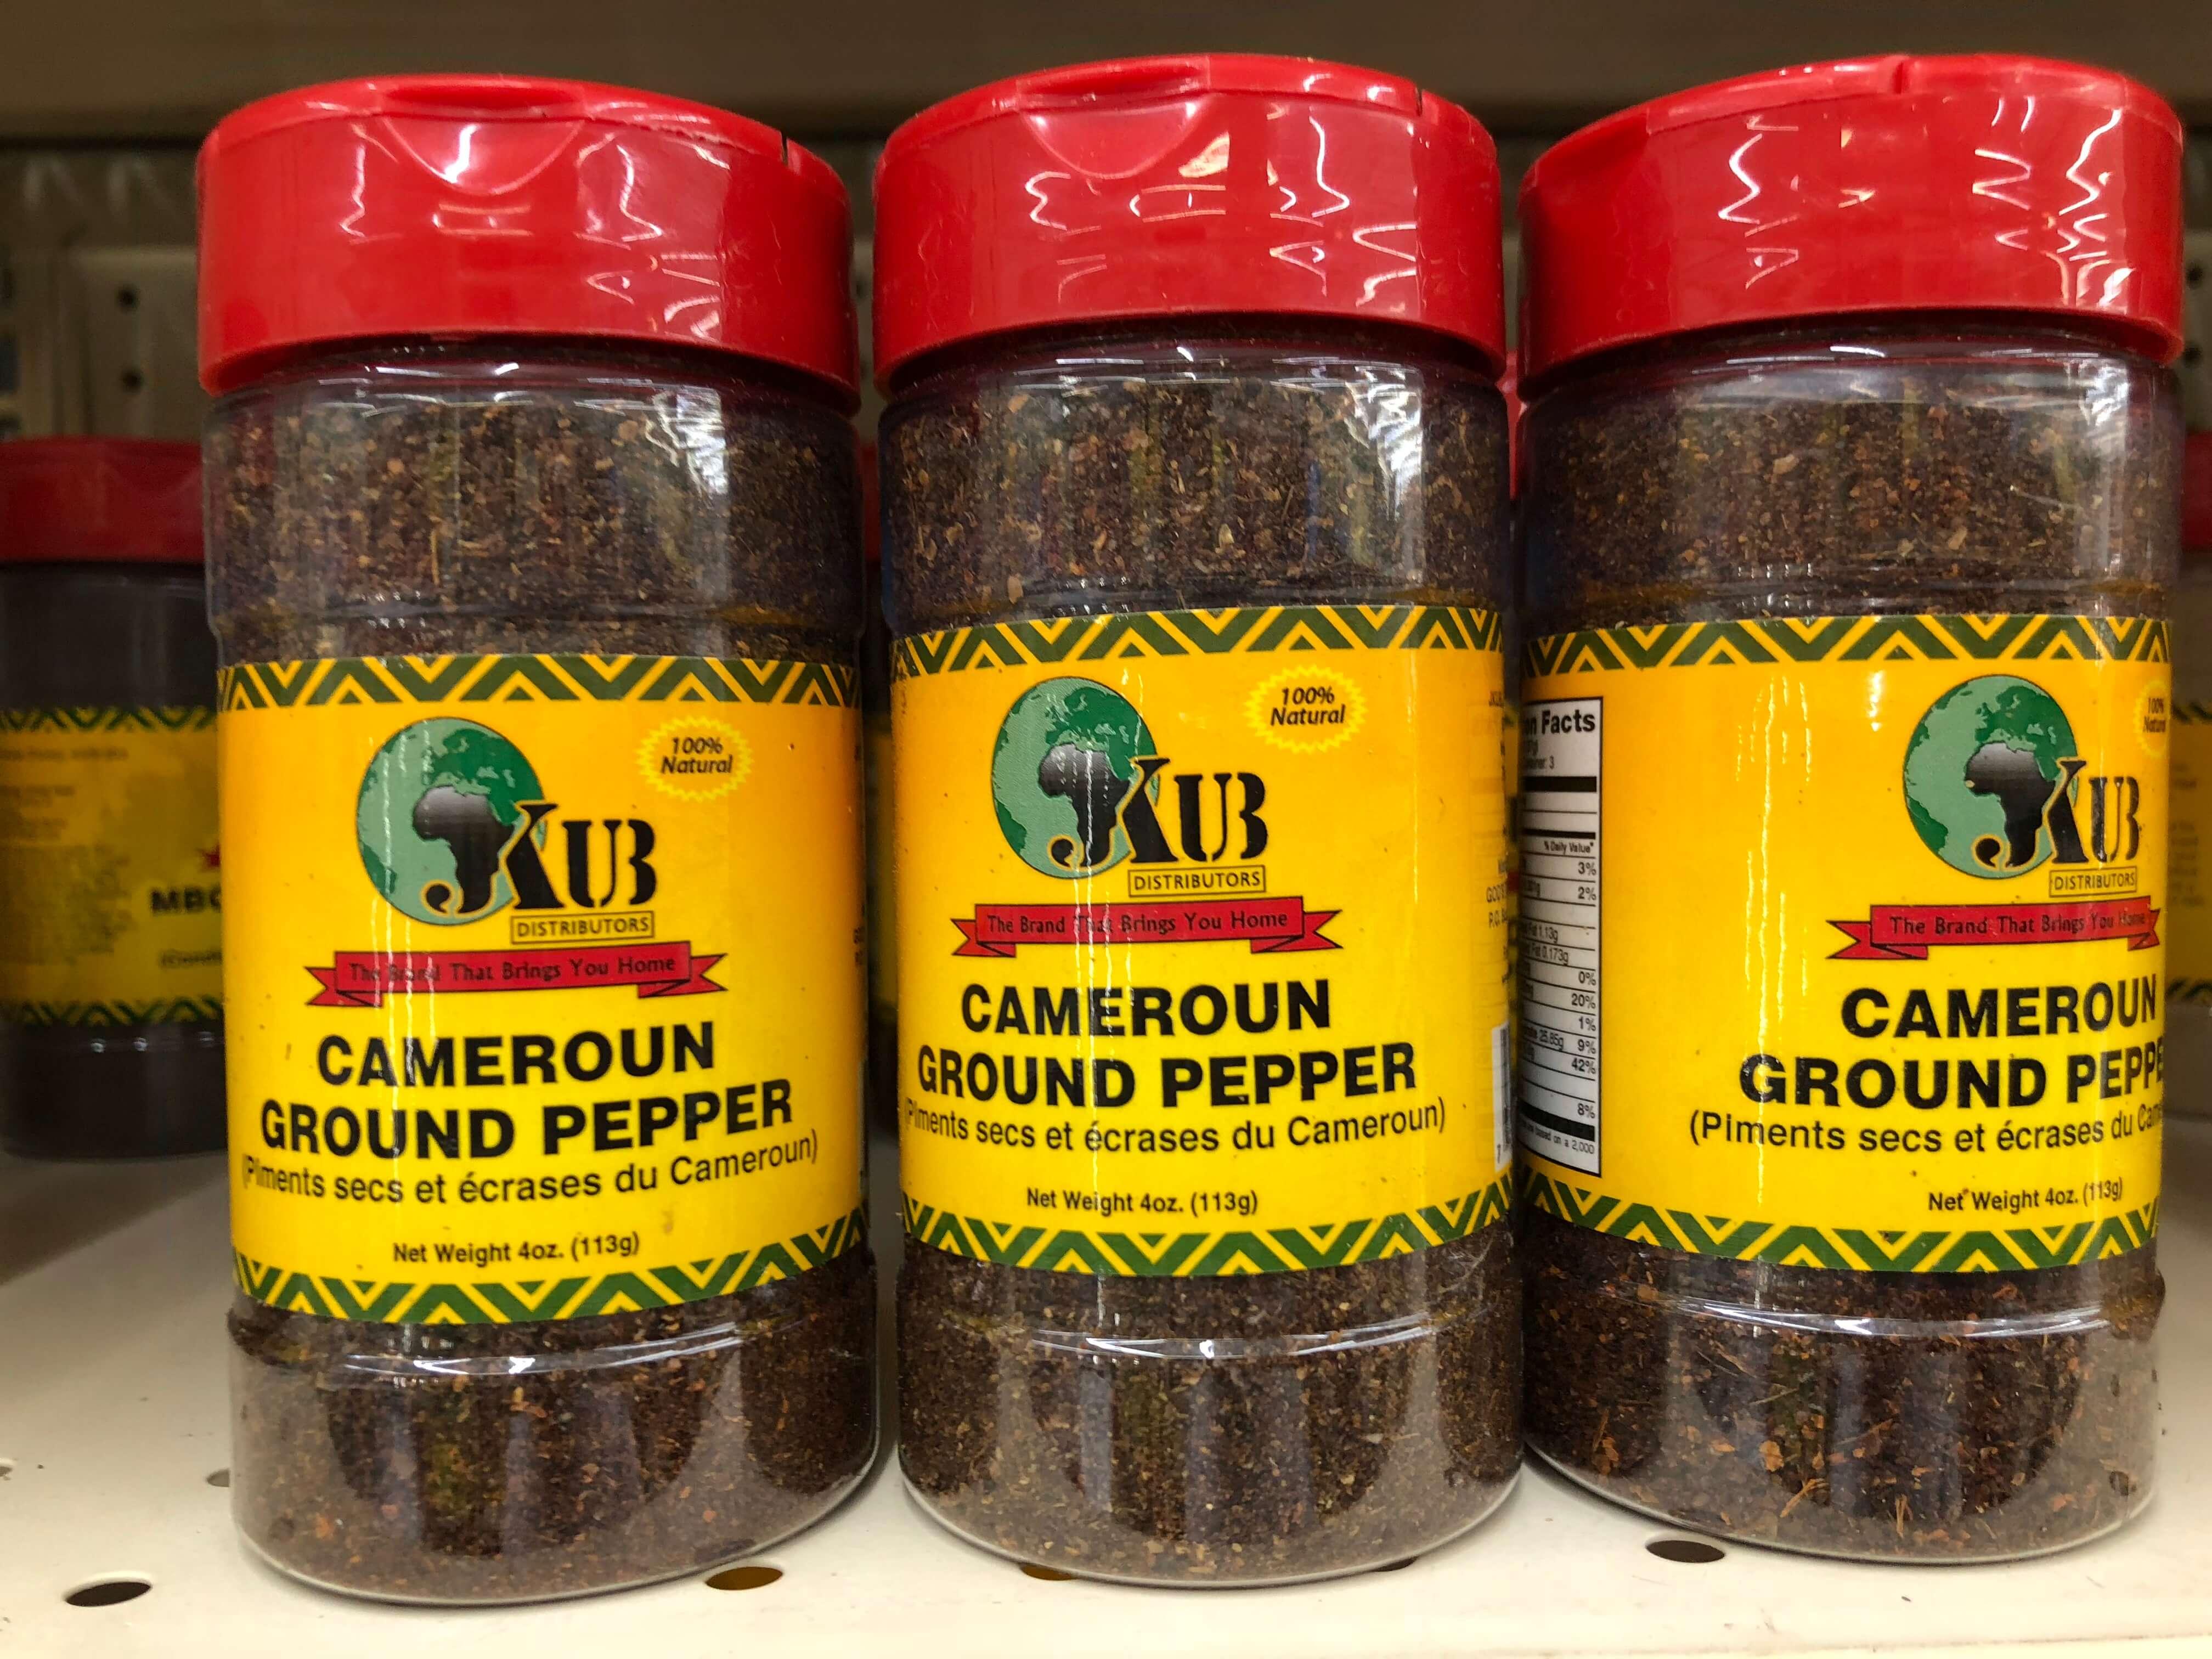 Cameroun-Ground-Pepper